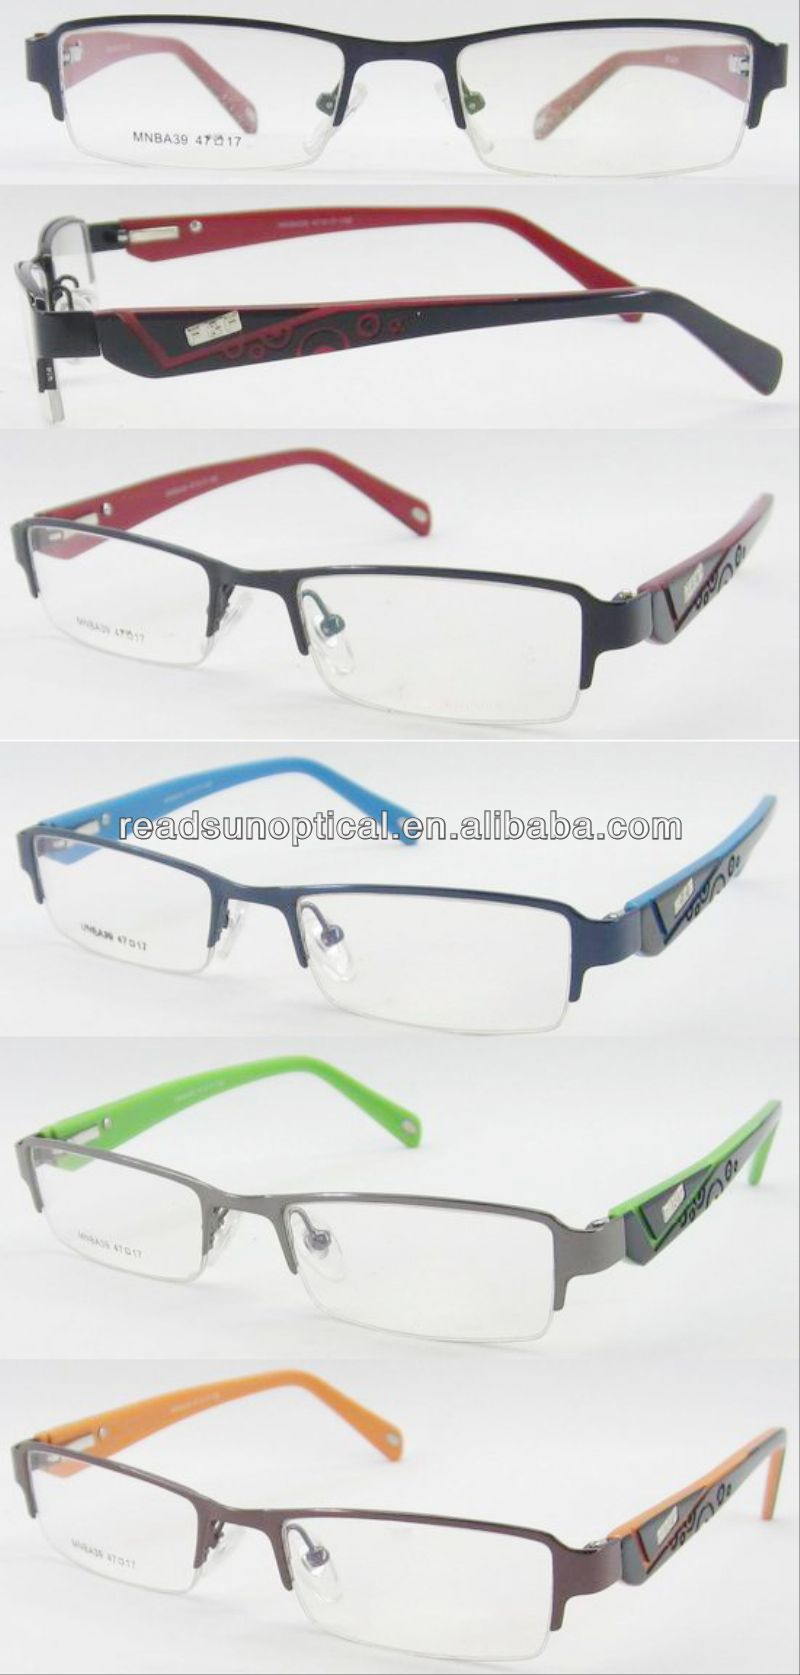 7b3c27b2f7 Bevel Eyewear Prescription Sports Eyewear Titan Eyewear - Buy Bevel ...